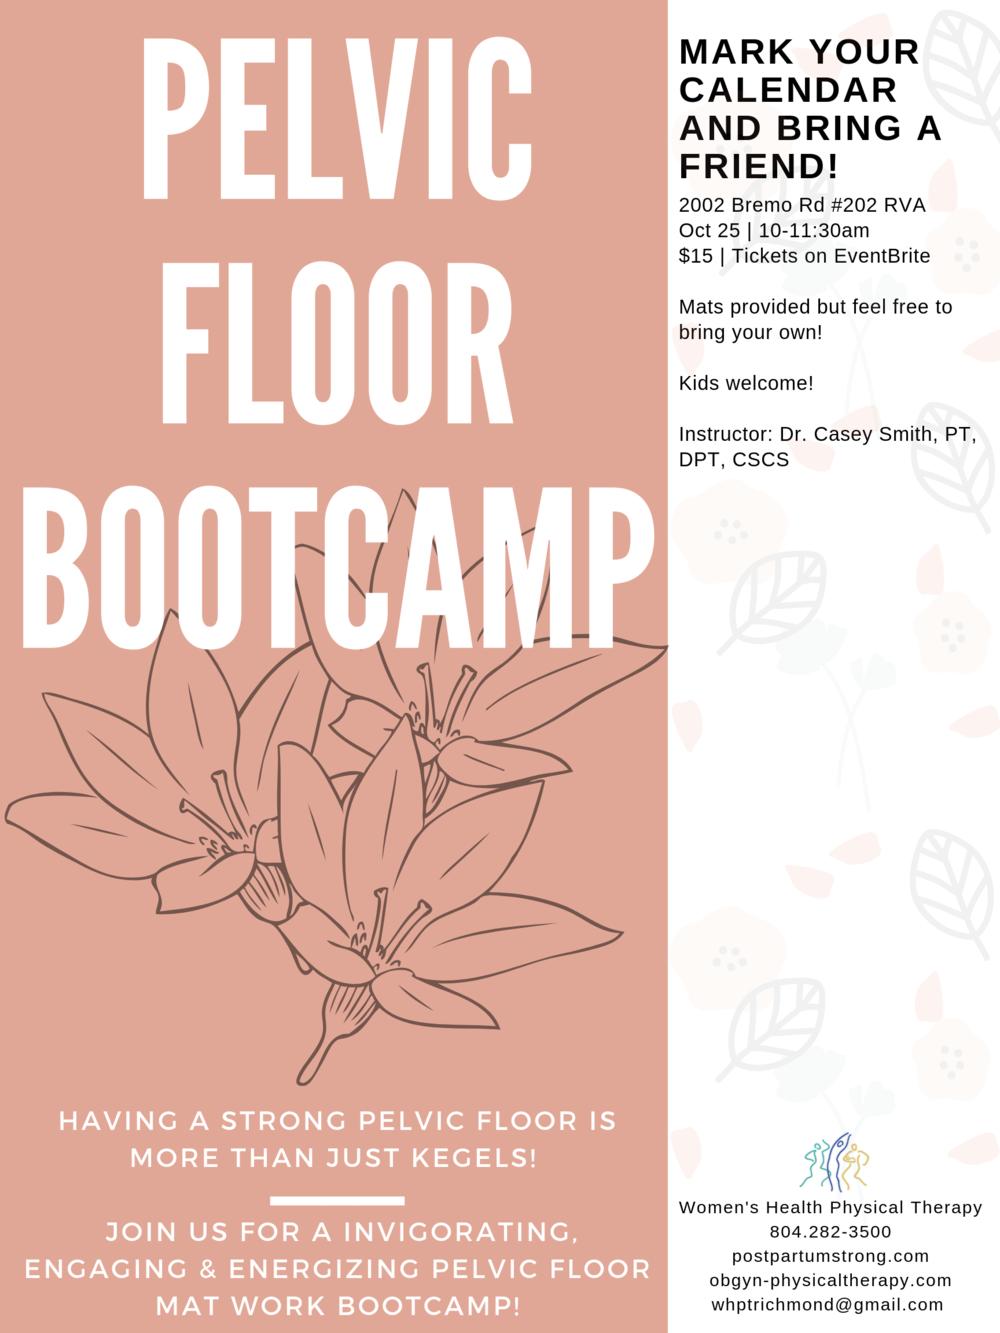 Pelvic Floor Bootcamp.png